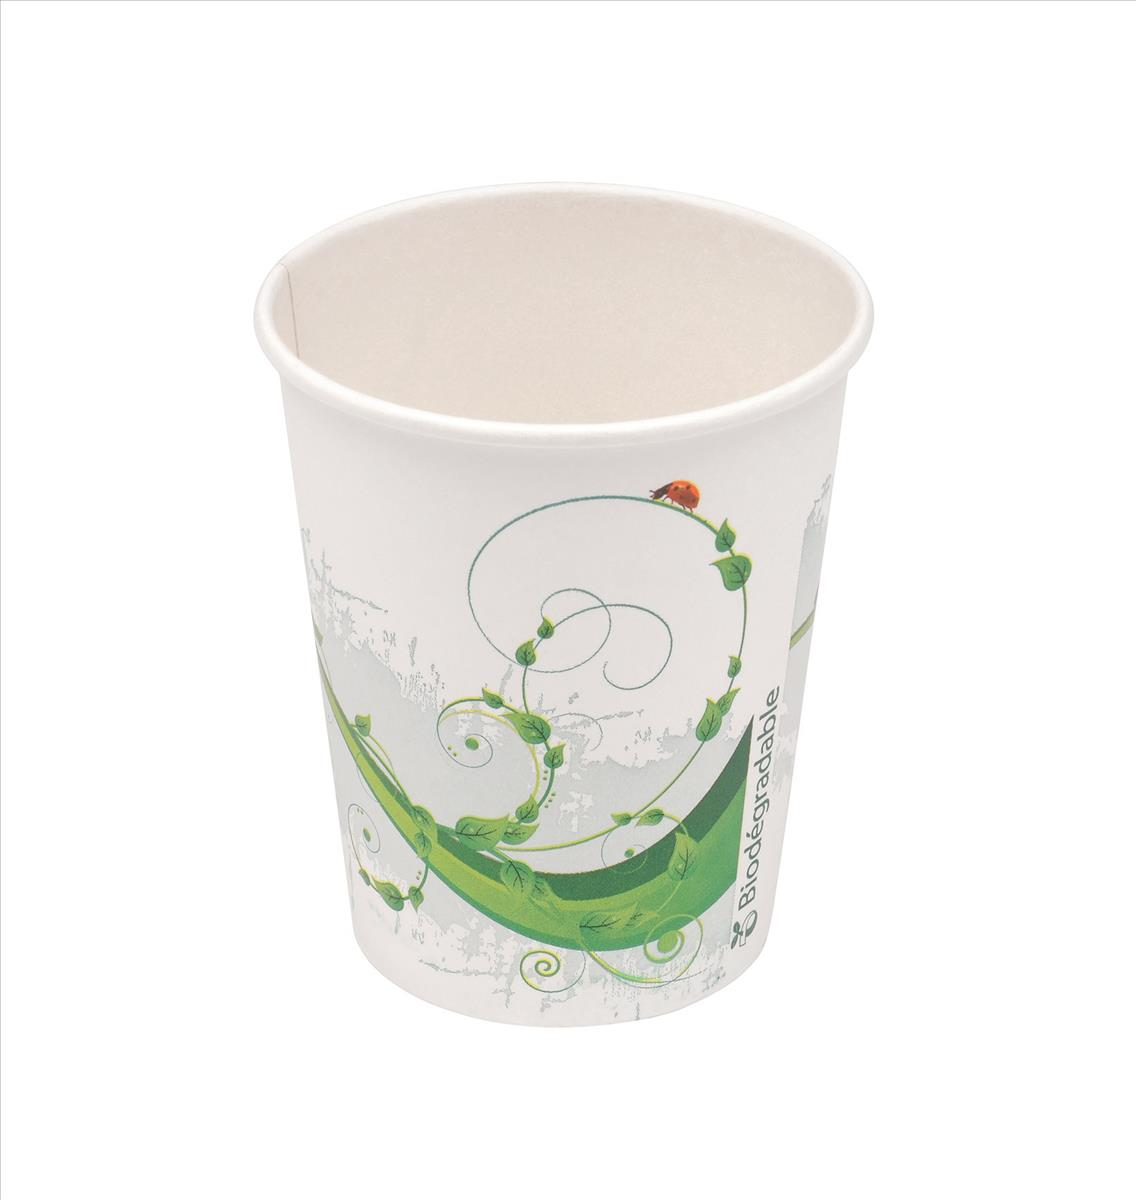 Stewart Superior Biodegradable PLA Cups 8oz 227ml